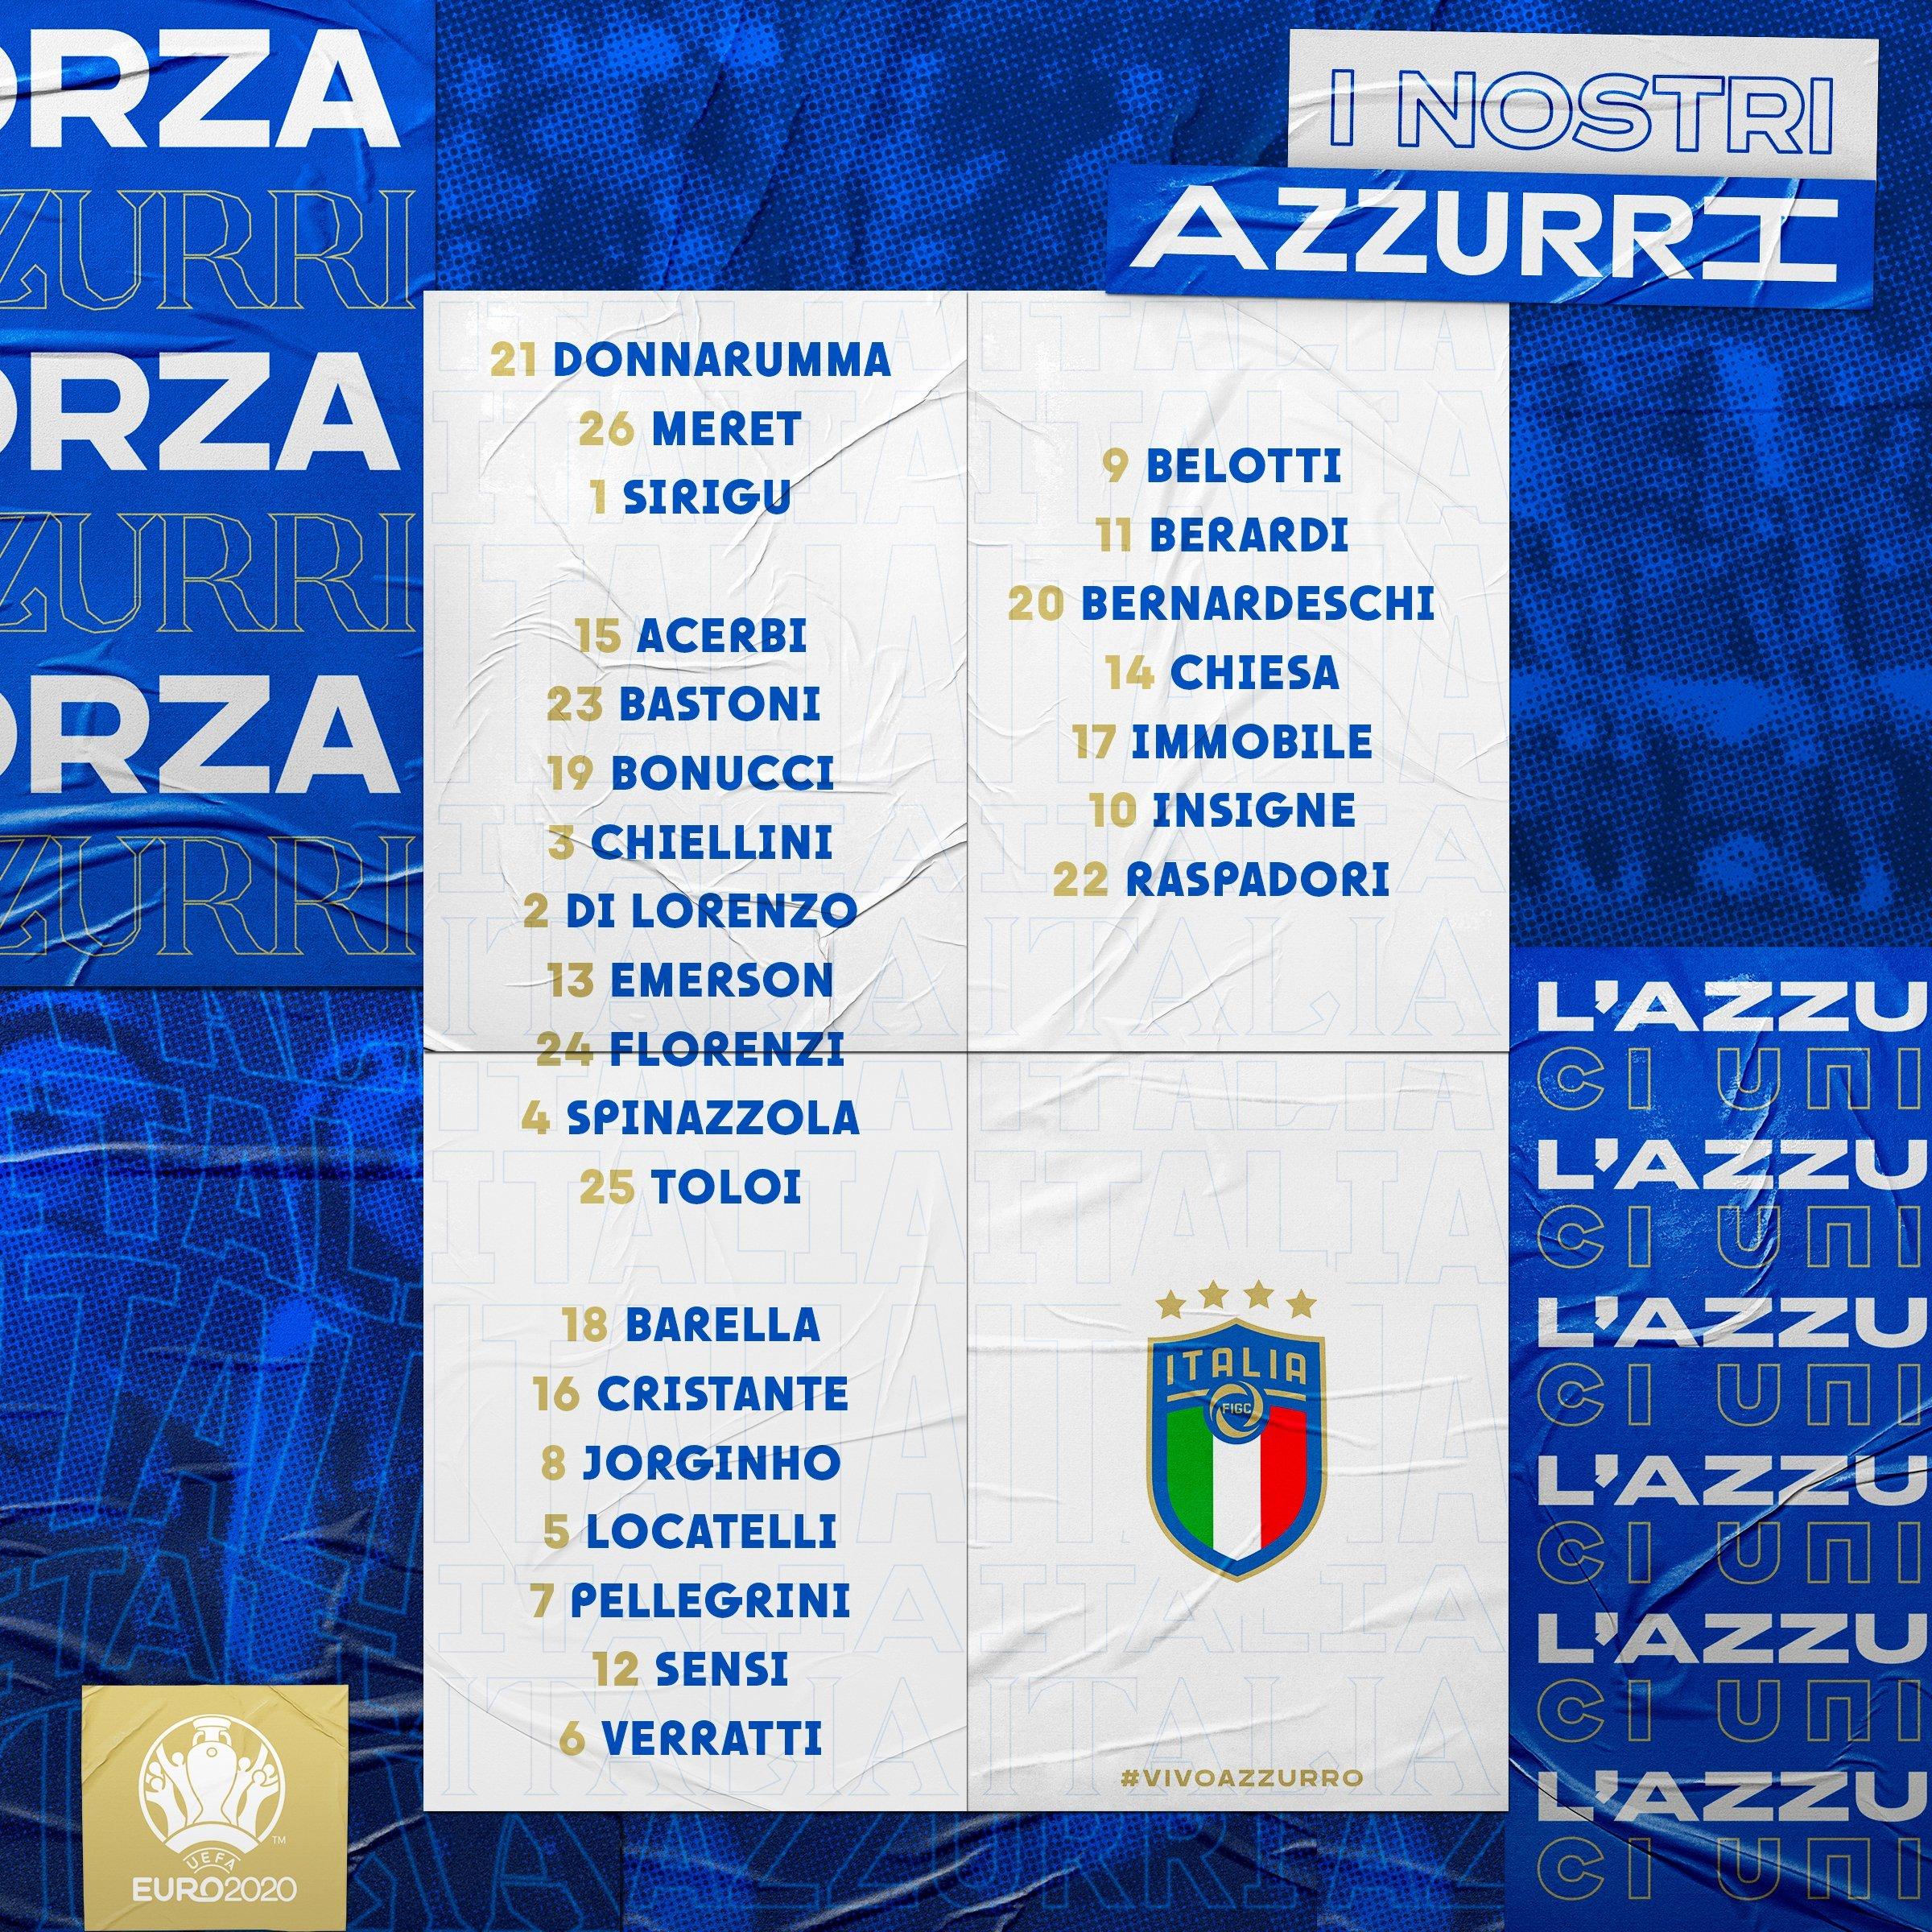 euro2020_italie.jpg (1.31 MB)